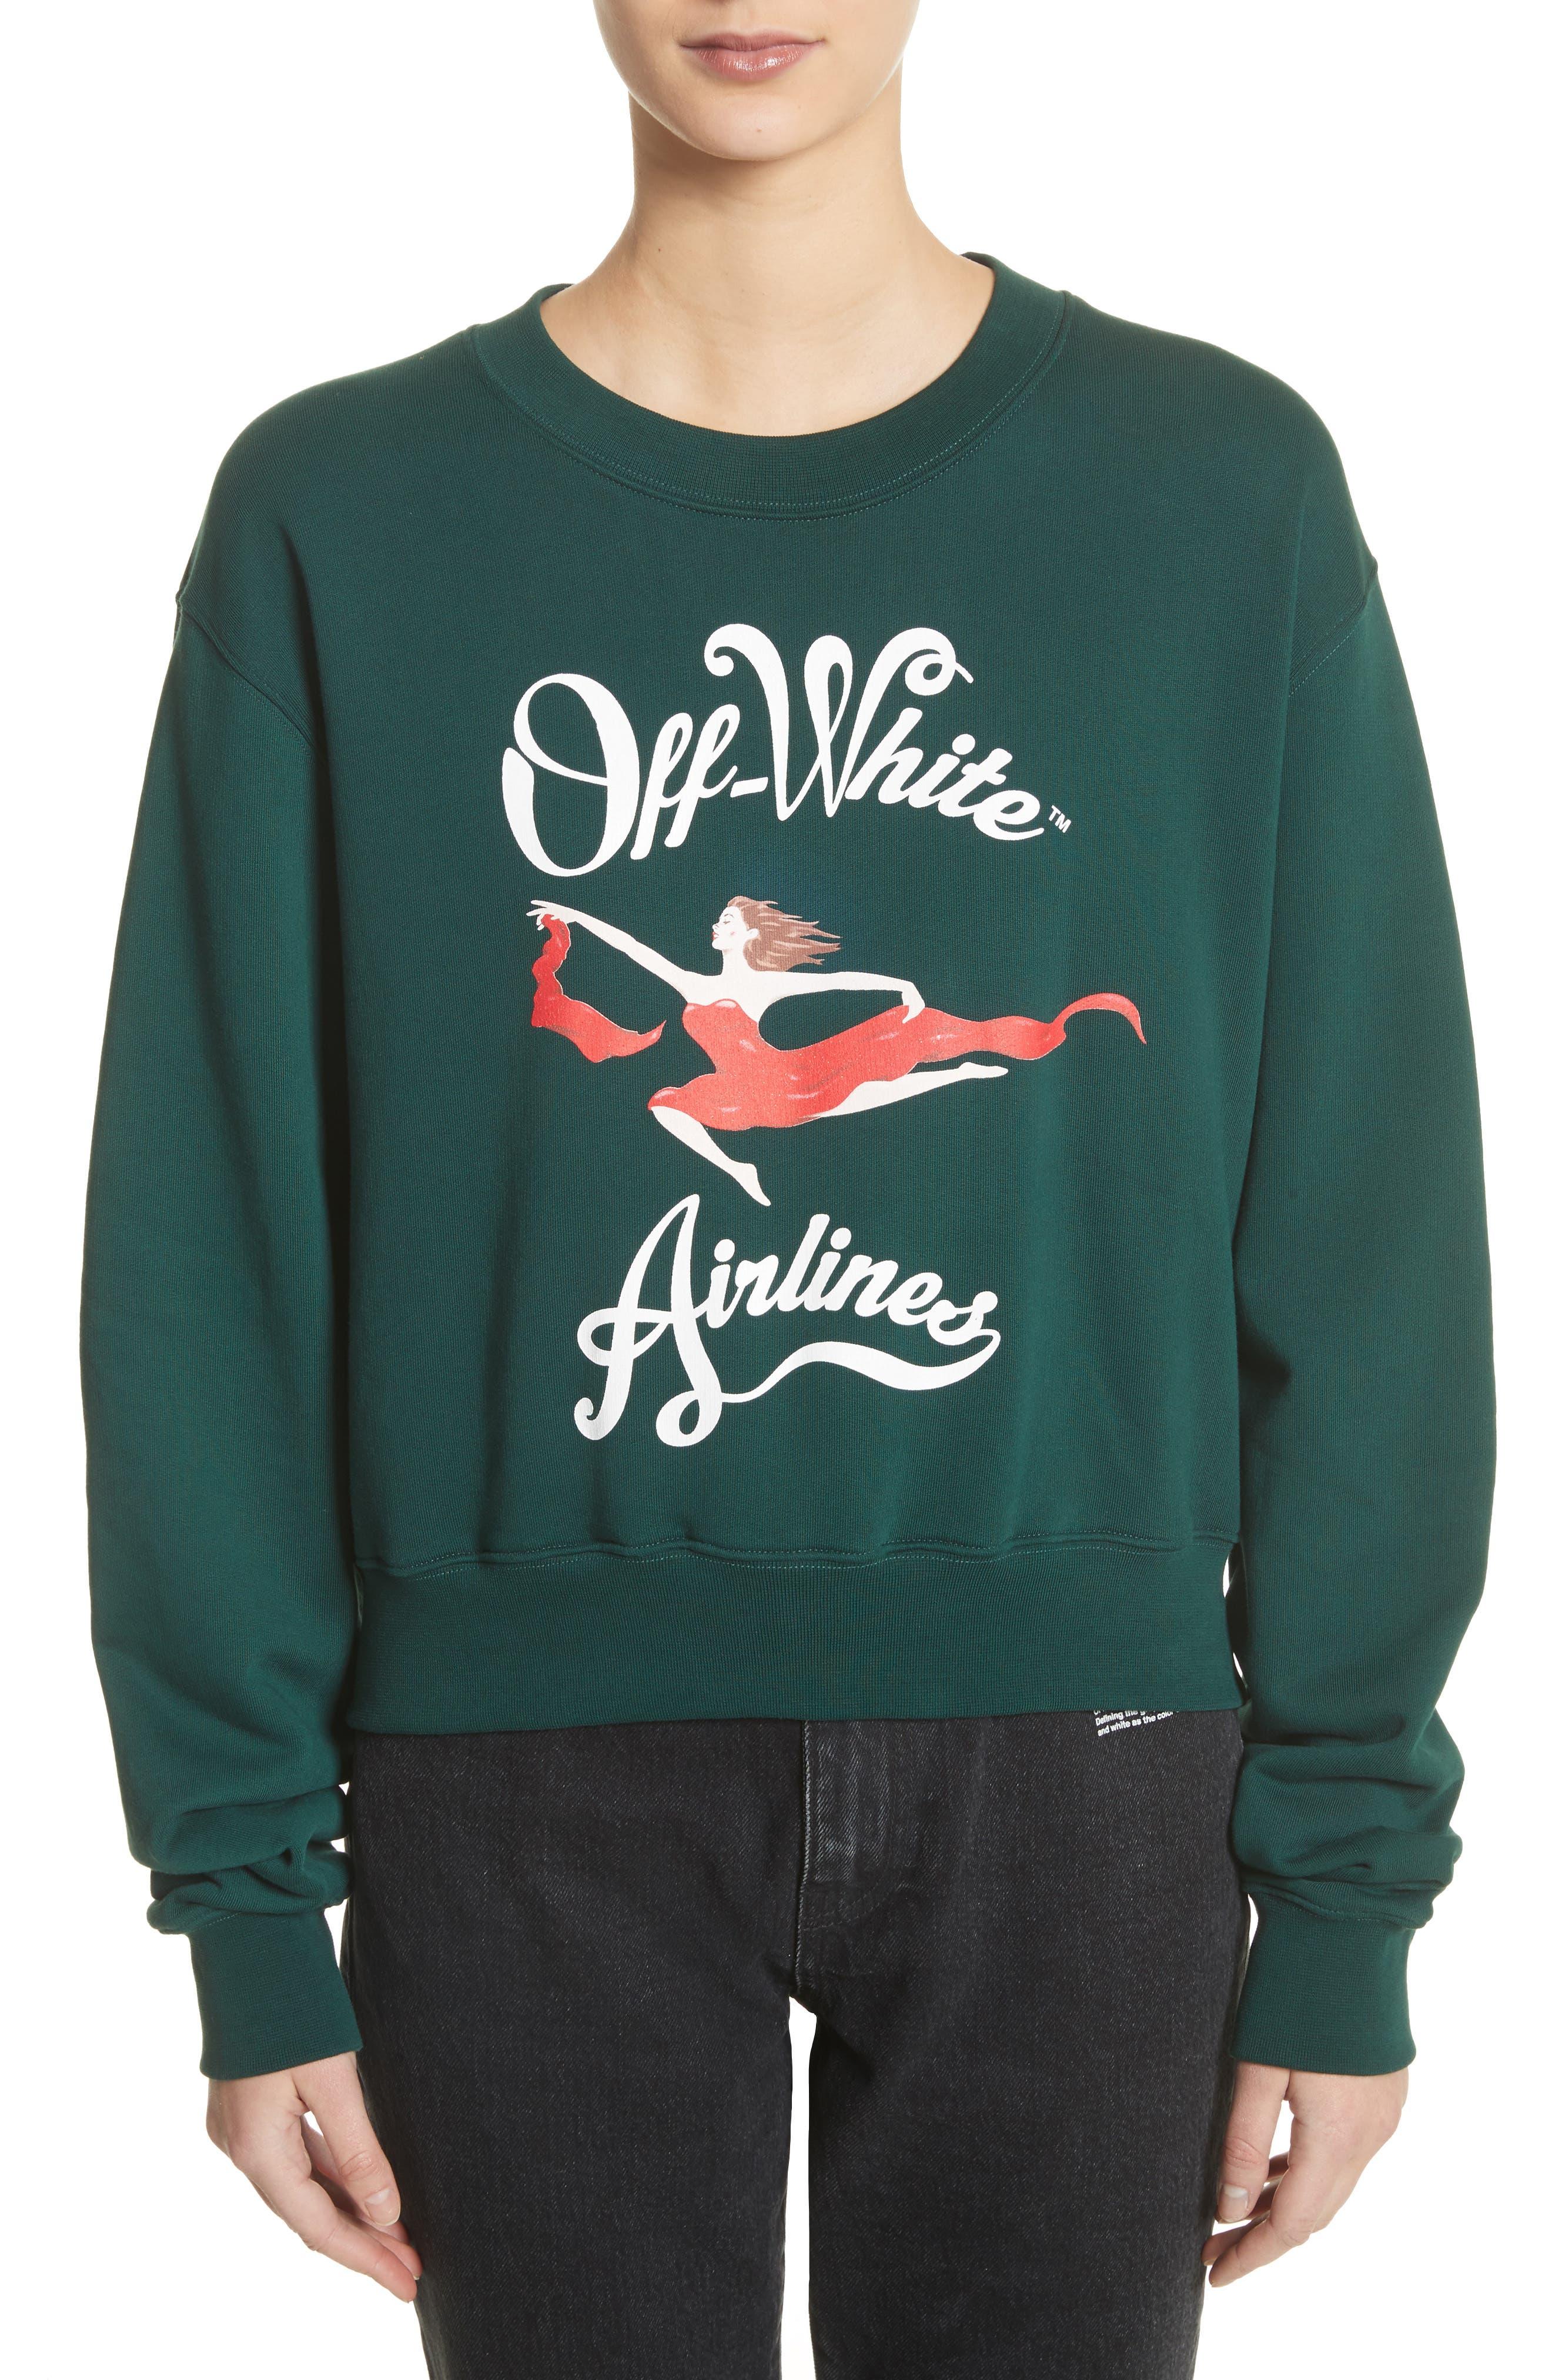 Airlines Crop Crewneck Sweatshirt,                             Main thumbnail 1, color,                             300